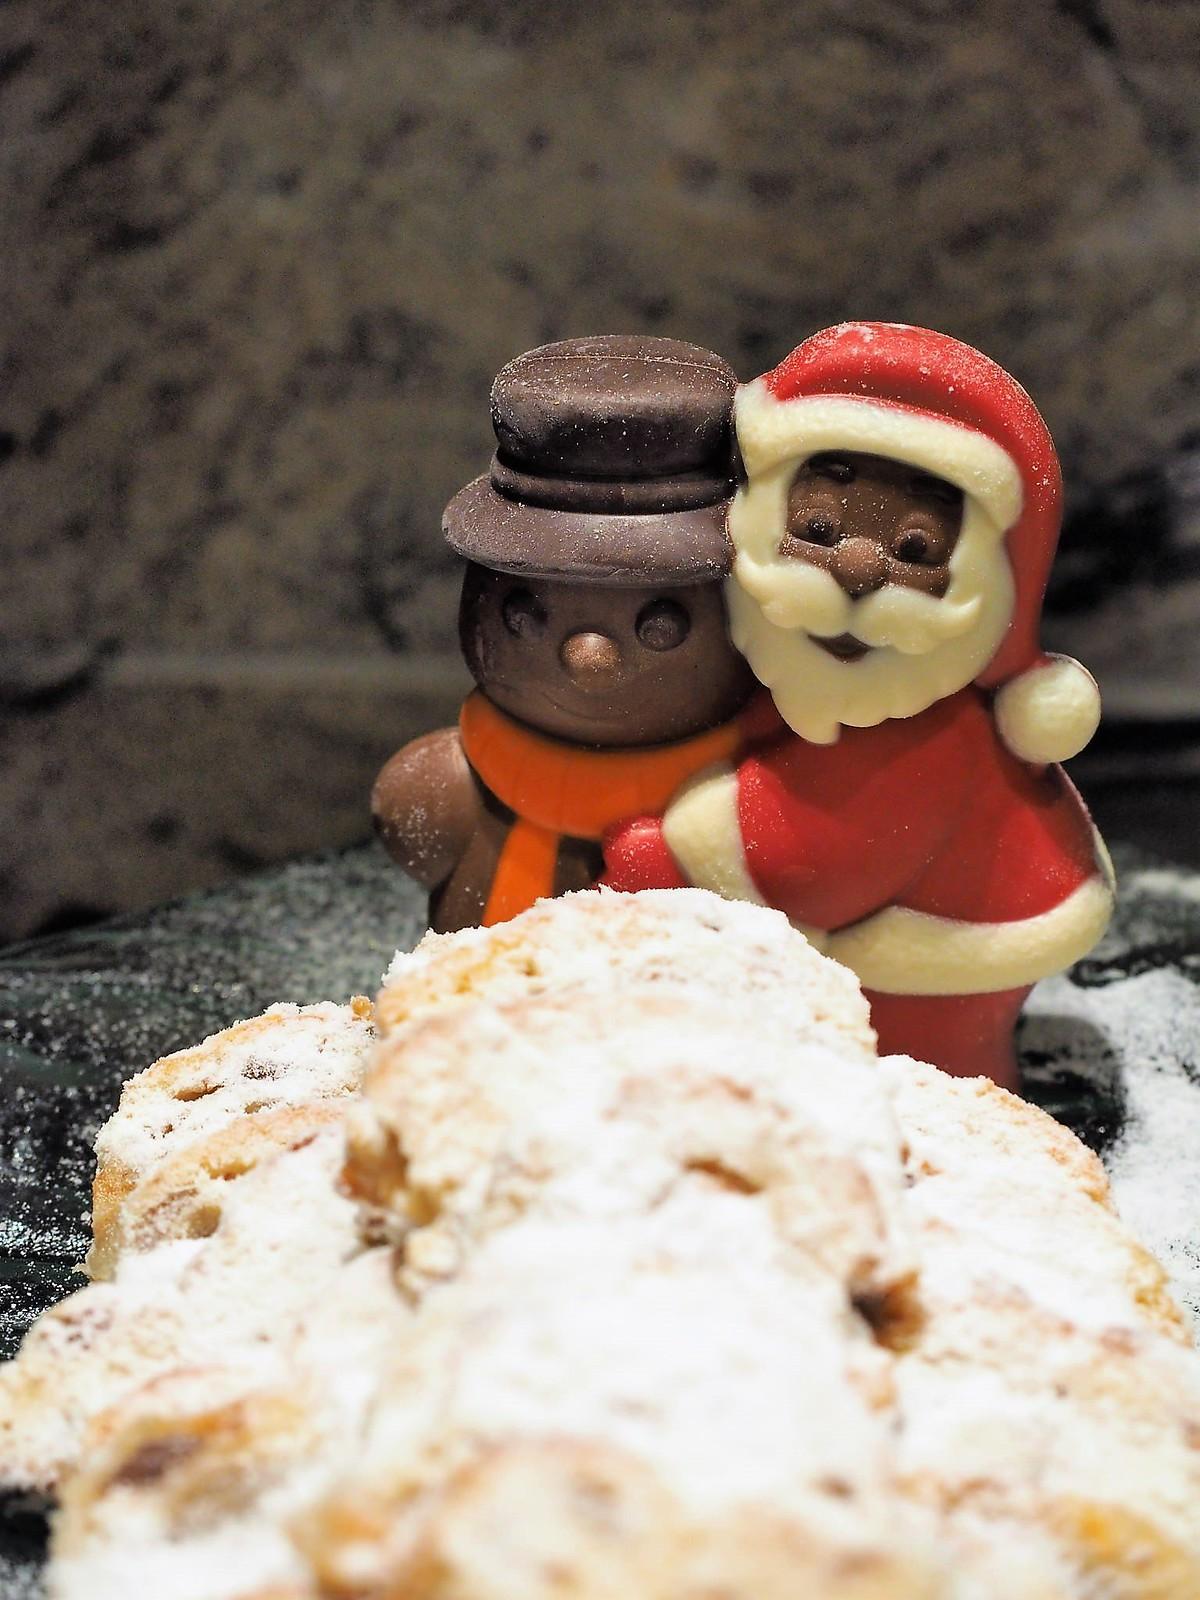 Santa and the snowman made Christmas cake